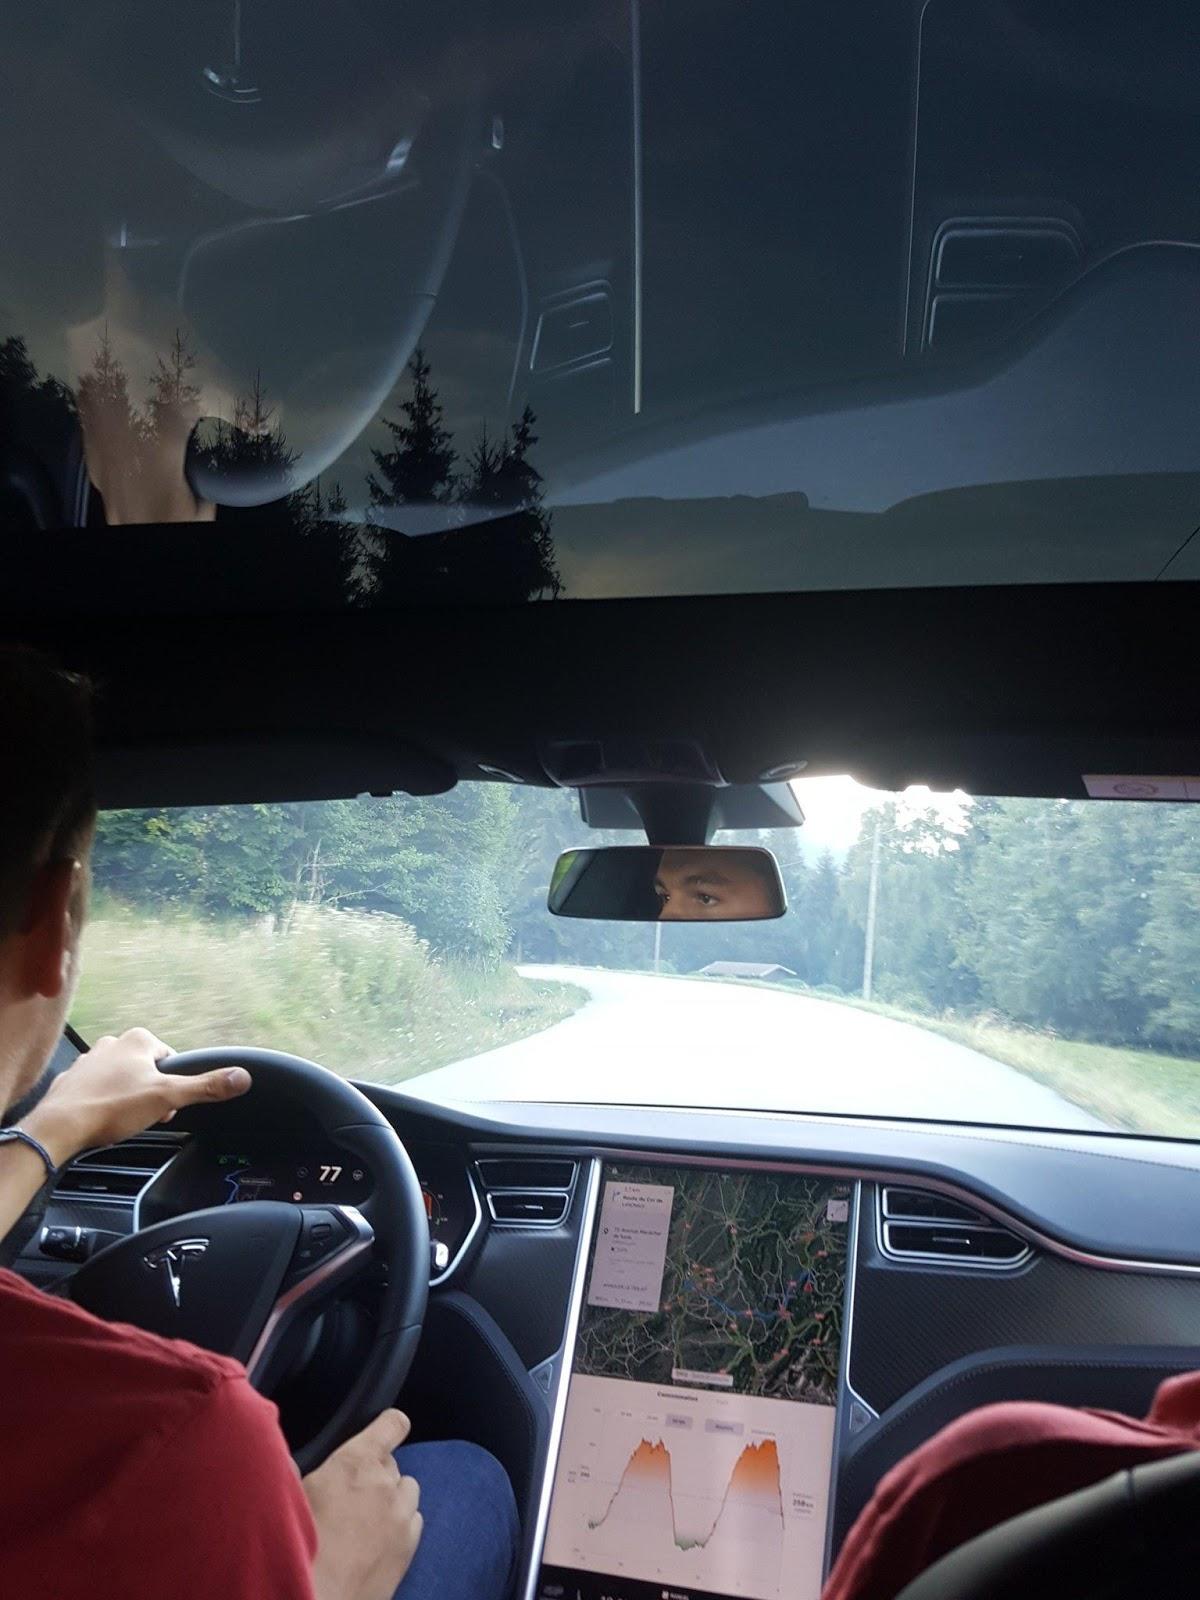 Cockpit_Tesla_Model_S_The_Good_Blog_The_Good_Car.jpg